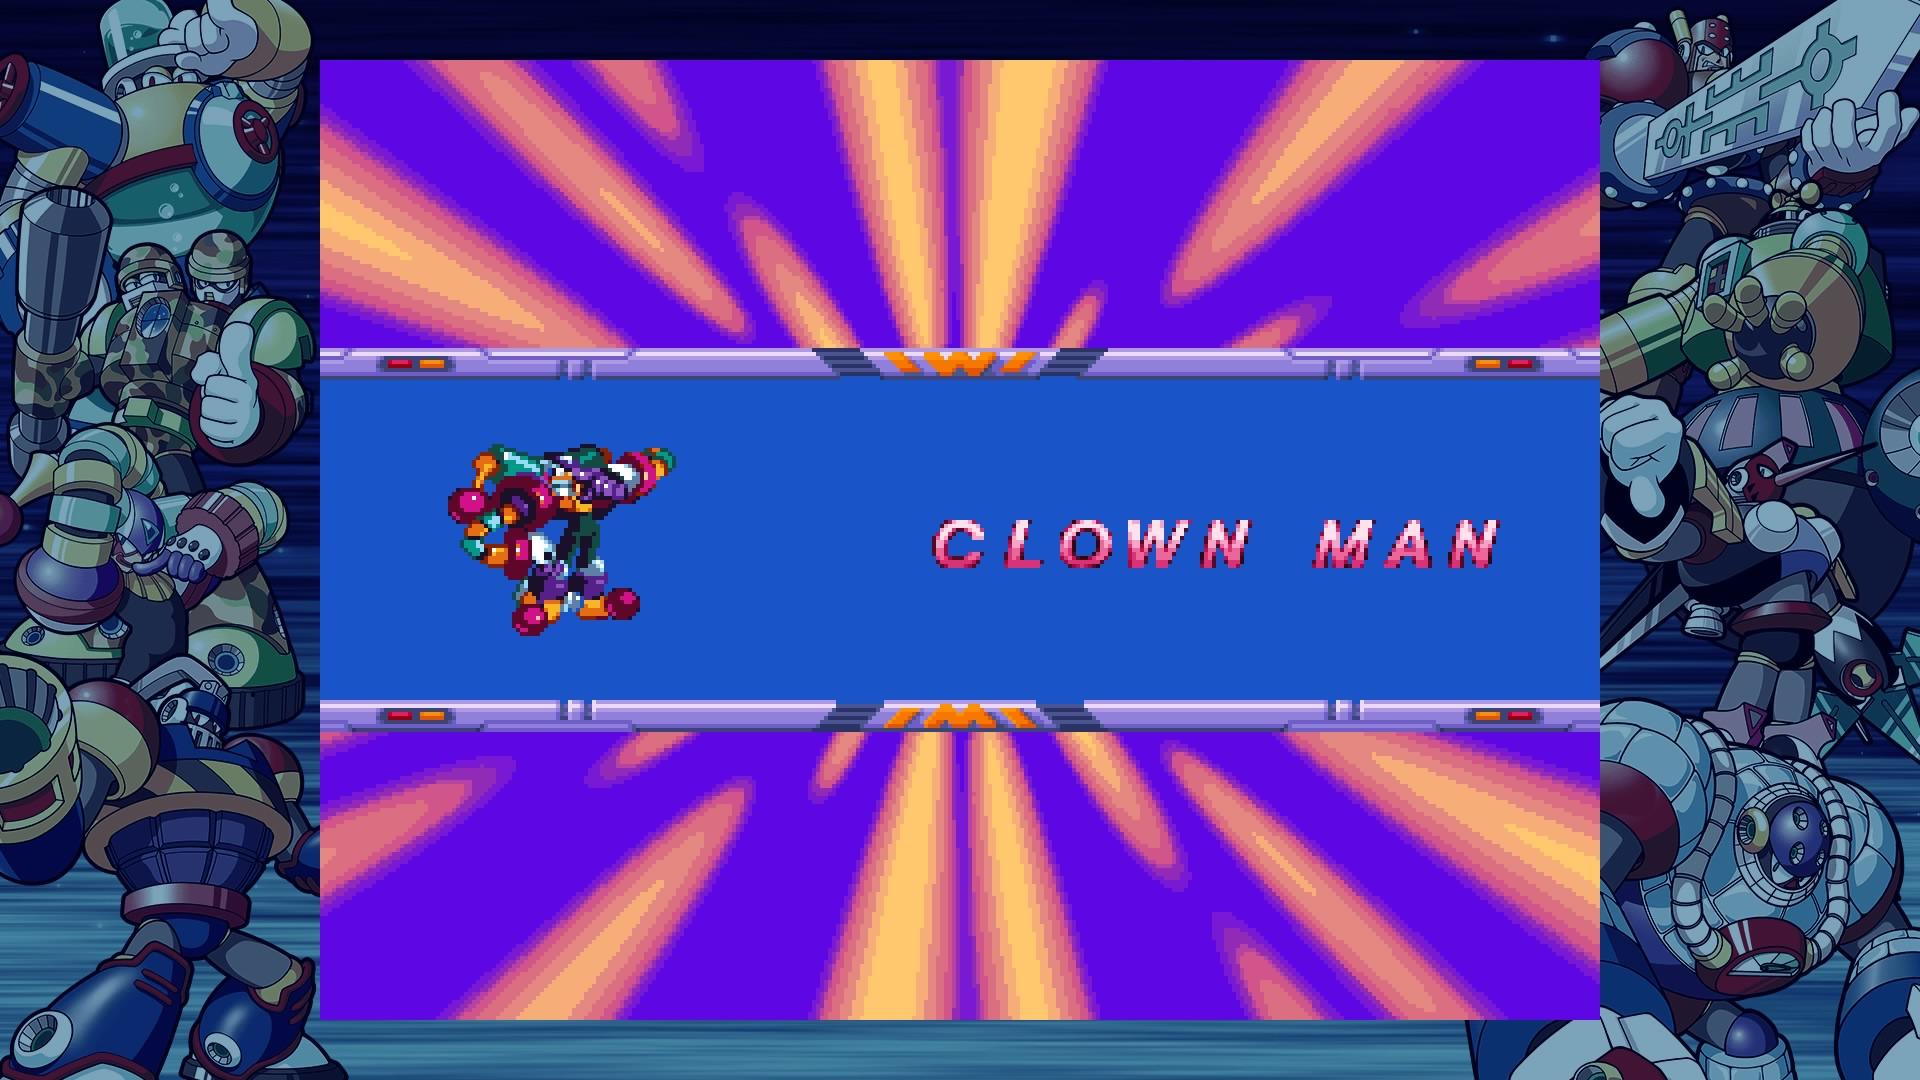 MegaManLegacyCollection2 PS4 Visuel 006